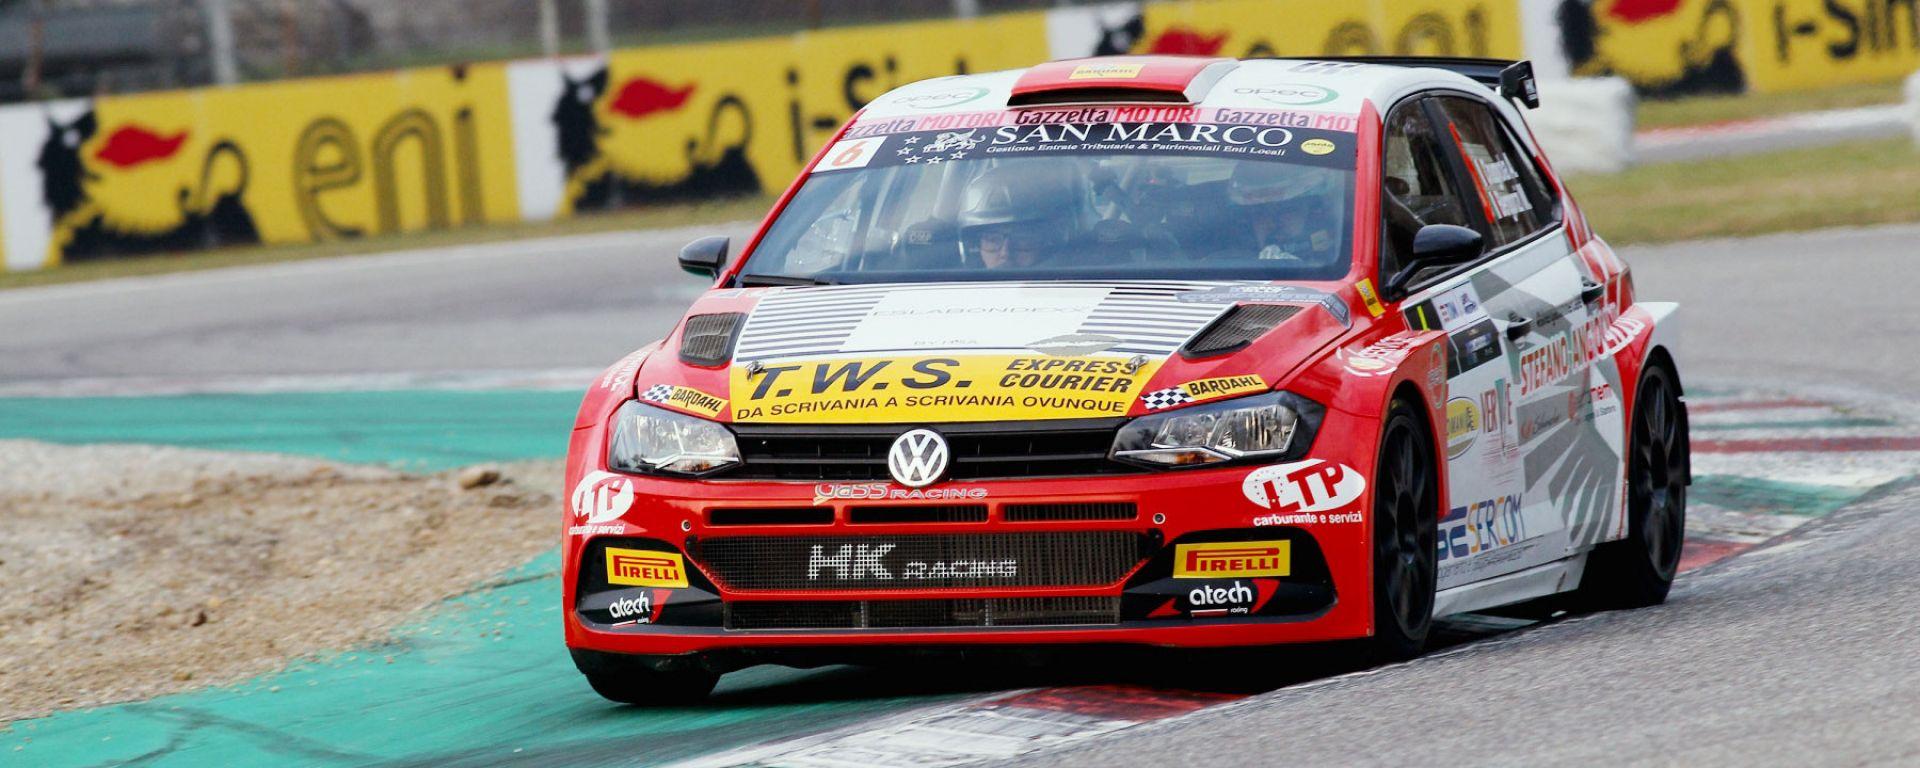 Monza Rally Show: Andrea Crugnola (Volkswagen Polo)